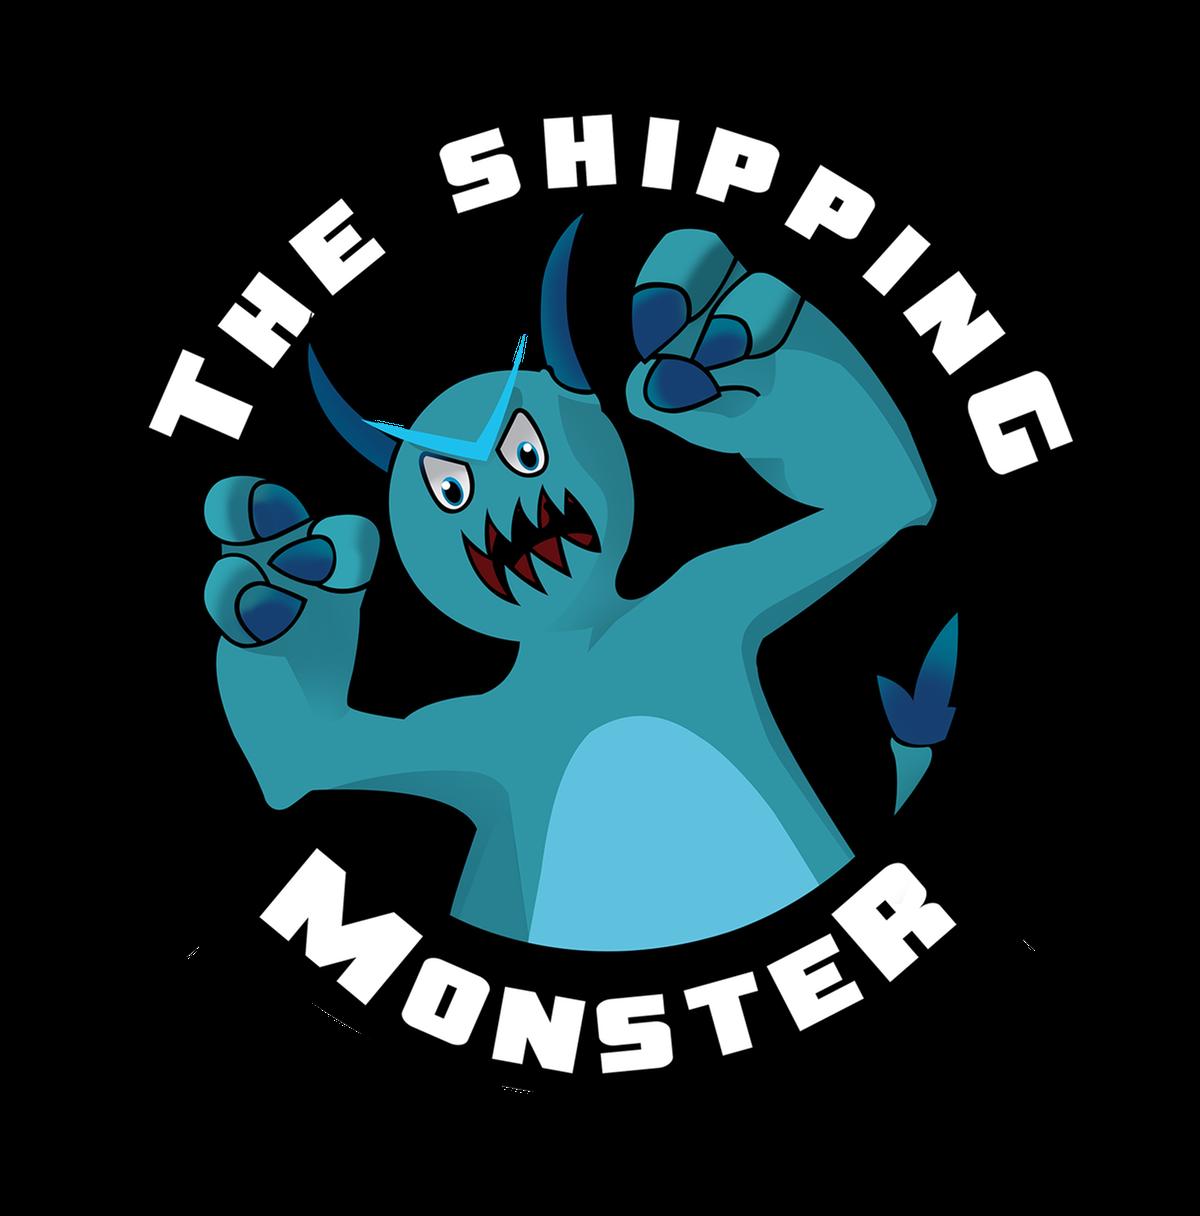 Shipping Monster Logo Tweak